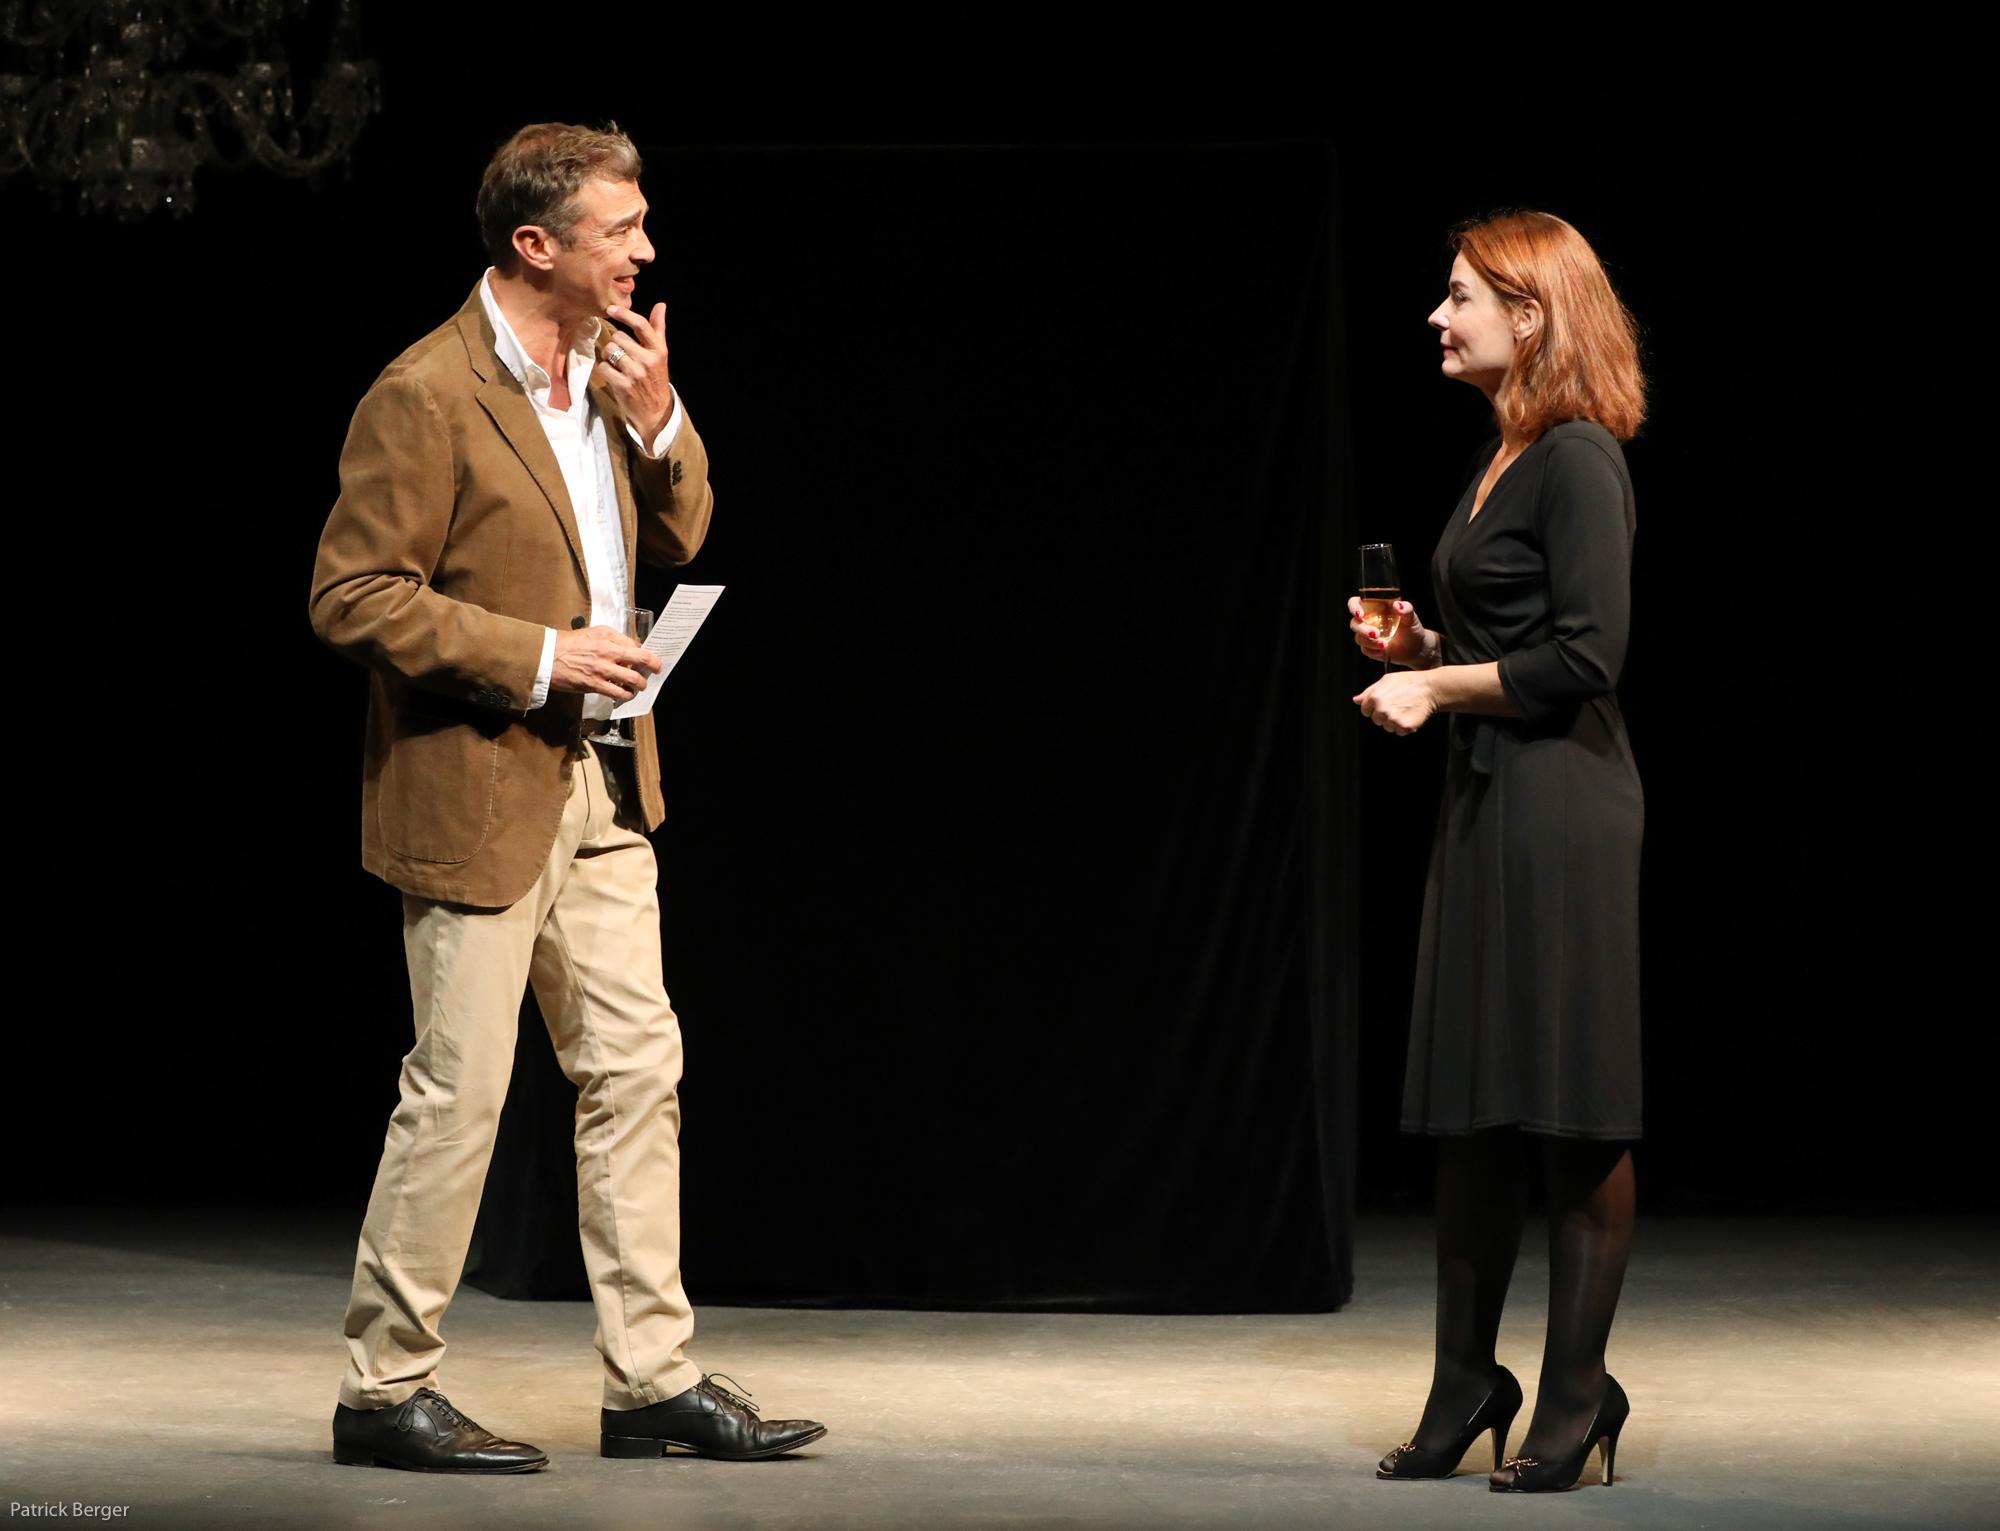 LA VIE REVEE D'HELEN COX (Christophe LIDON 2018)